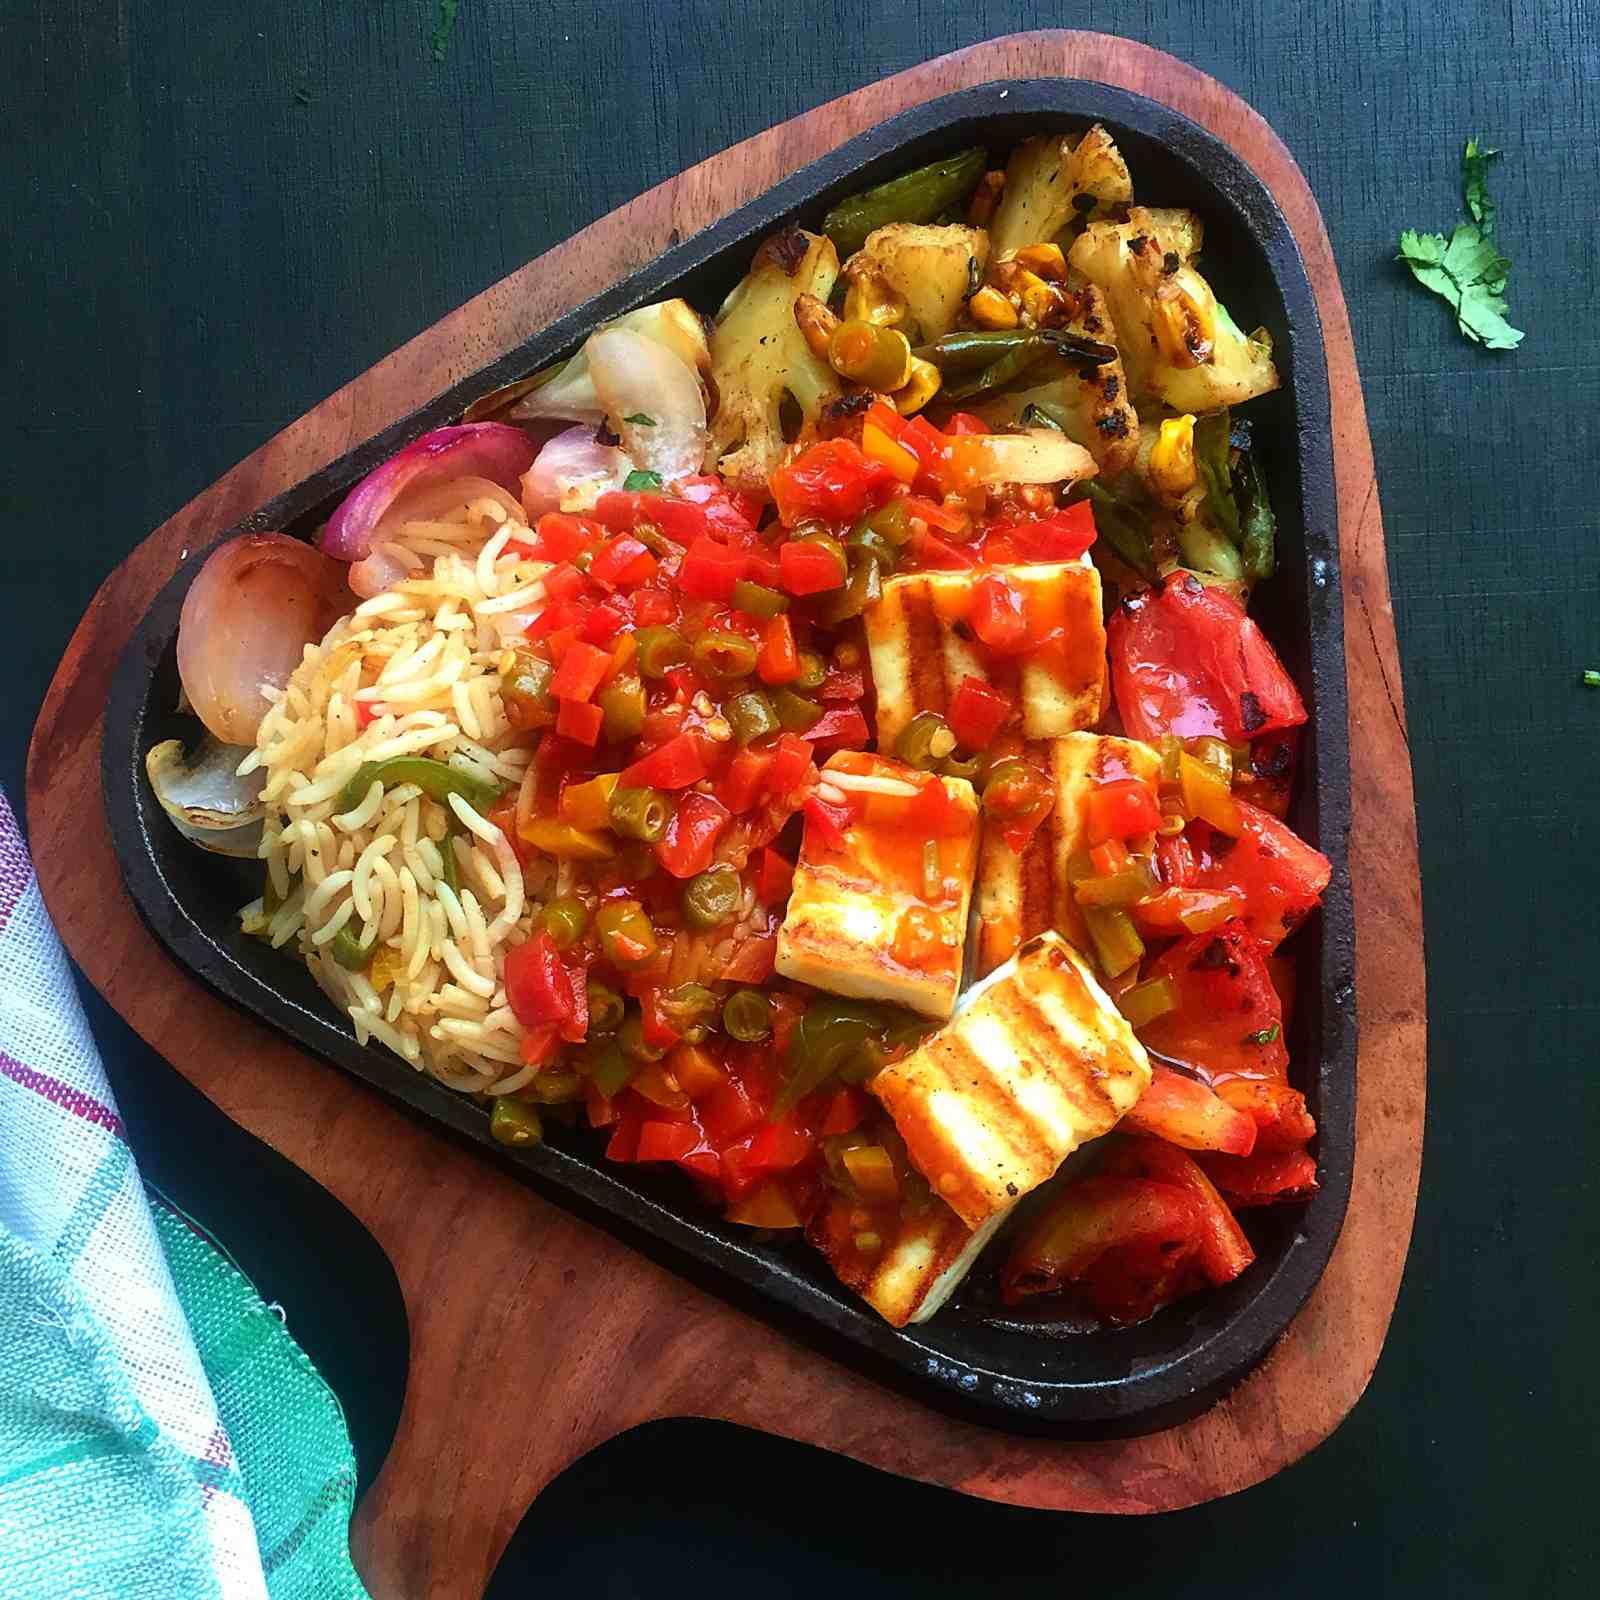 Paneer sizzler recipe in chilli garlic sauce with rice by archanas paneer sizzler recipe in chilli garlic sauce with rice forumfinder Image collections